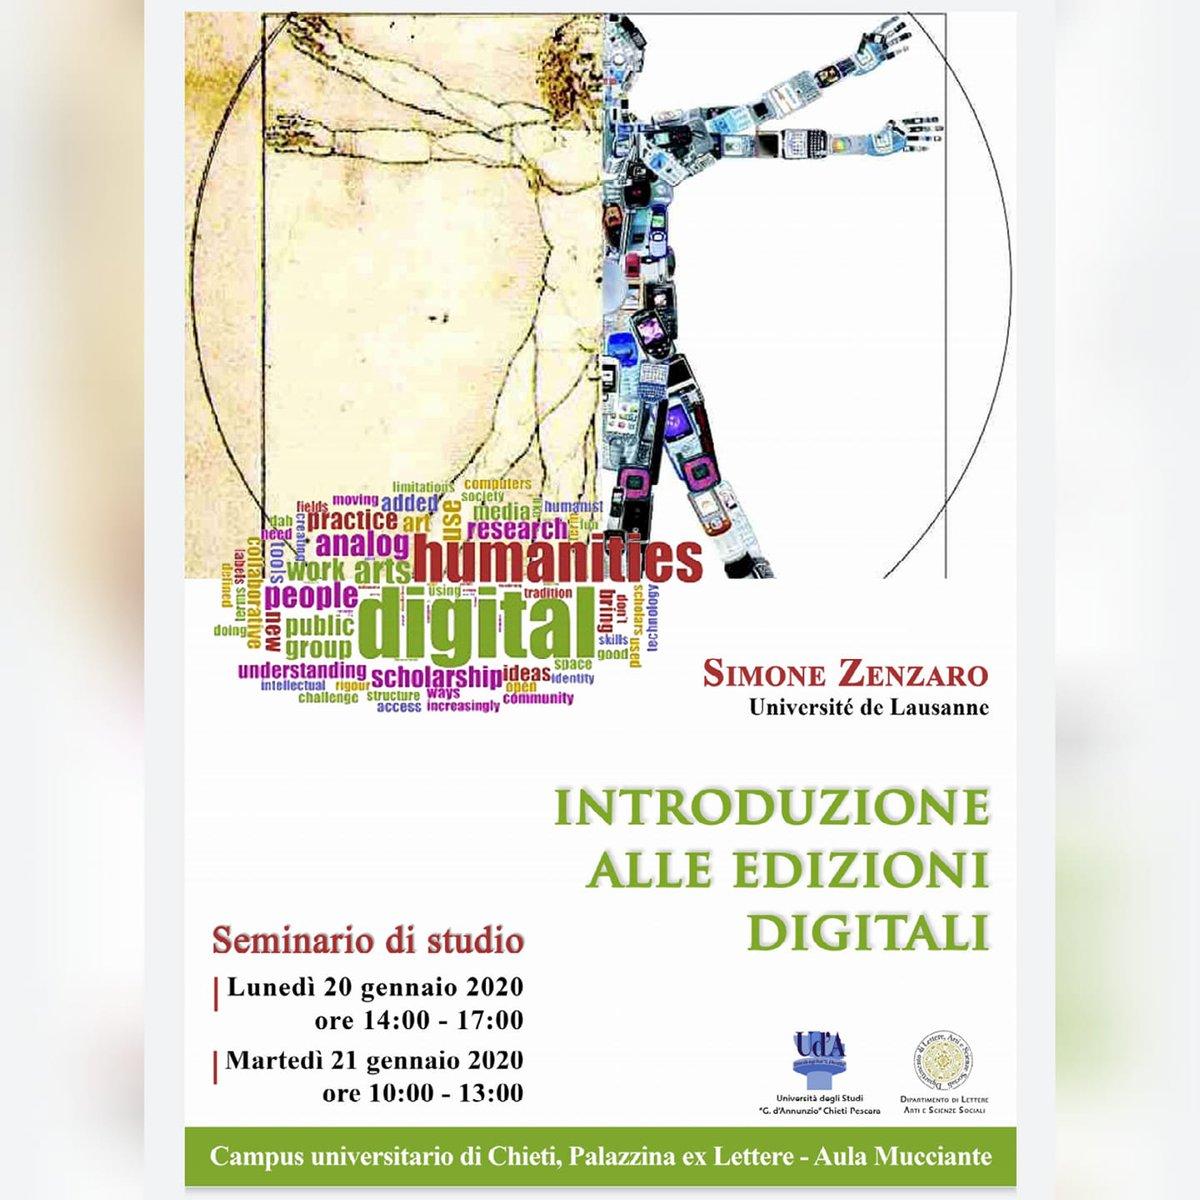 An introduction to Digital editions and digital editing by Simone Zenzaro, 20-21 January 2020, Università di Chieti. #digitalhumanities #digitalphilology #evtpic.twitter.com/i2MwgwkCzL